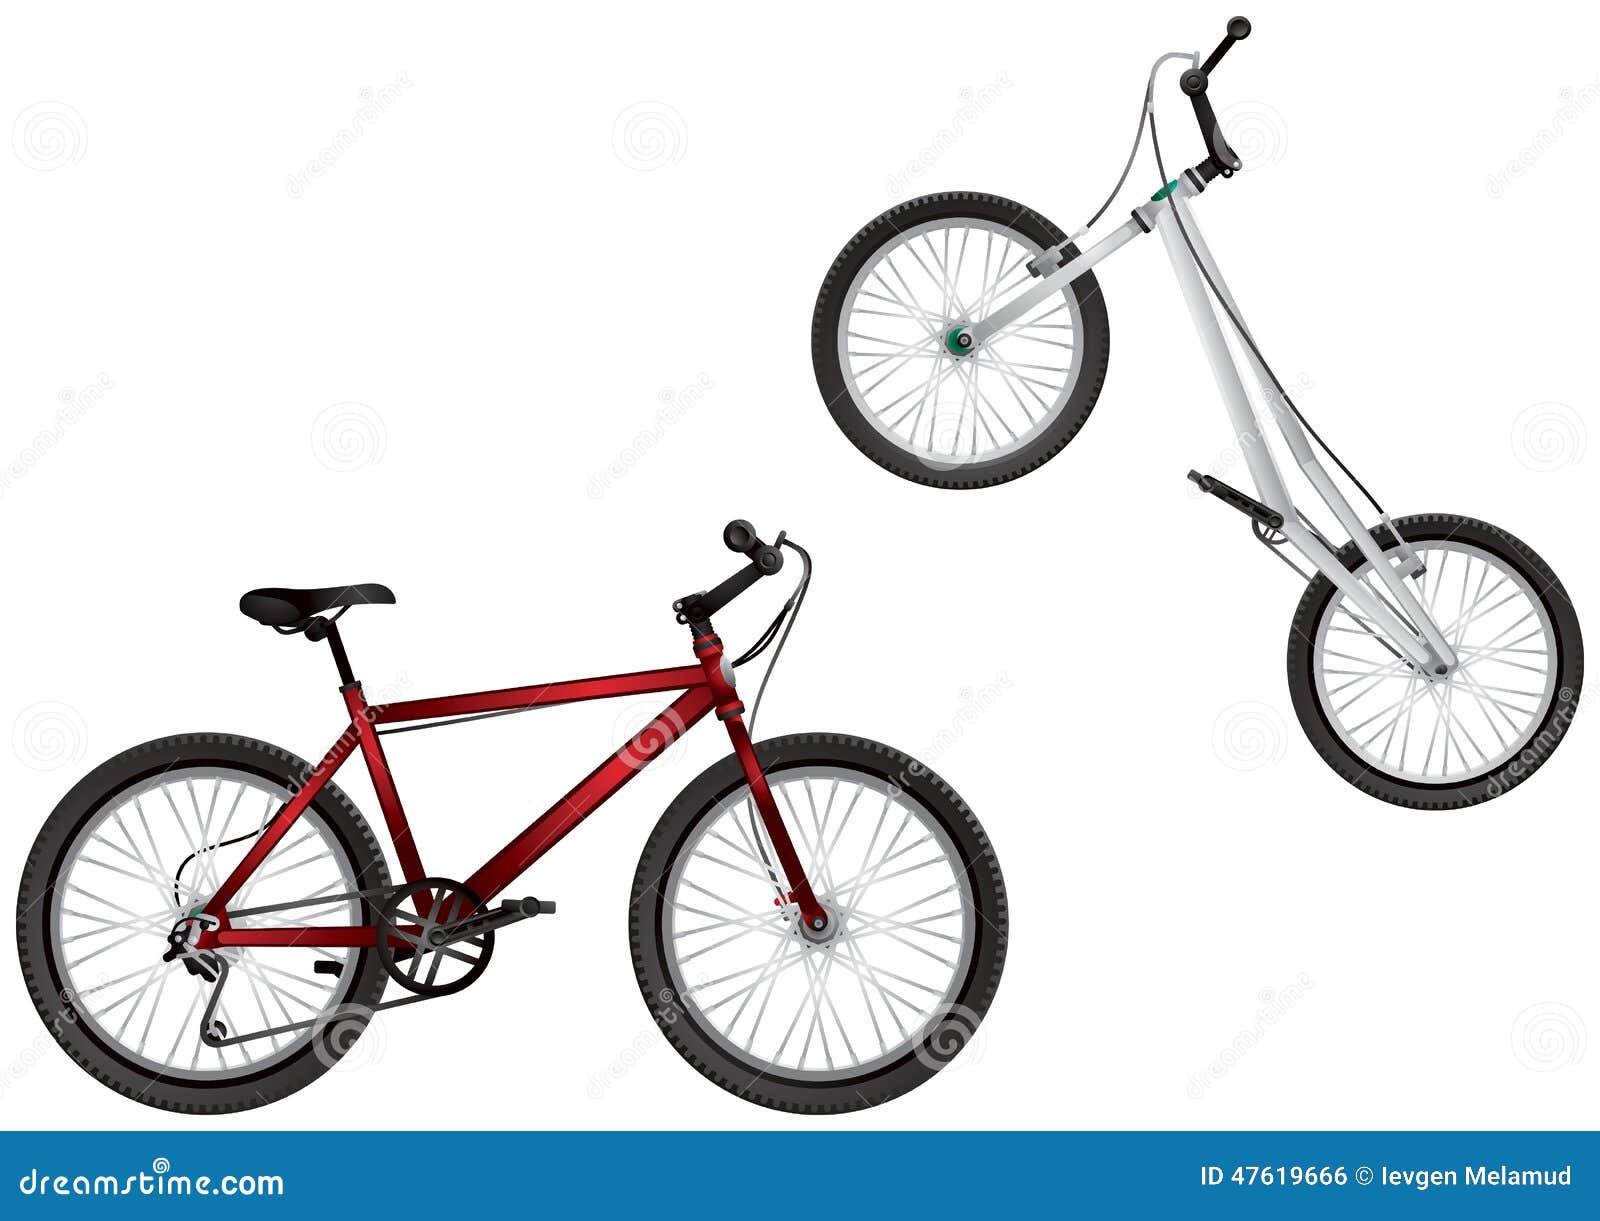 Bmx Bike Mountain Bike Extreme Sport Bicycles Stock Vector